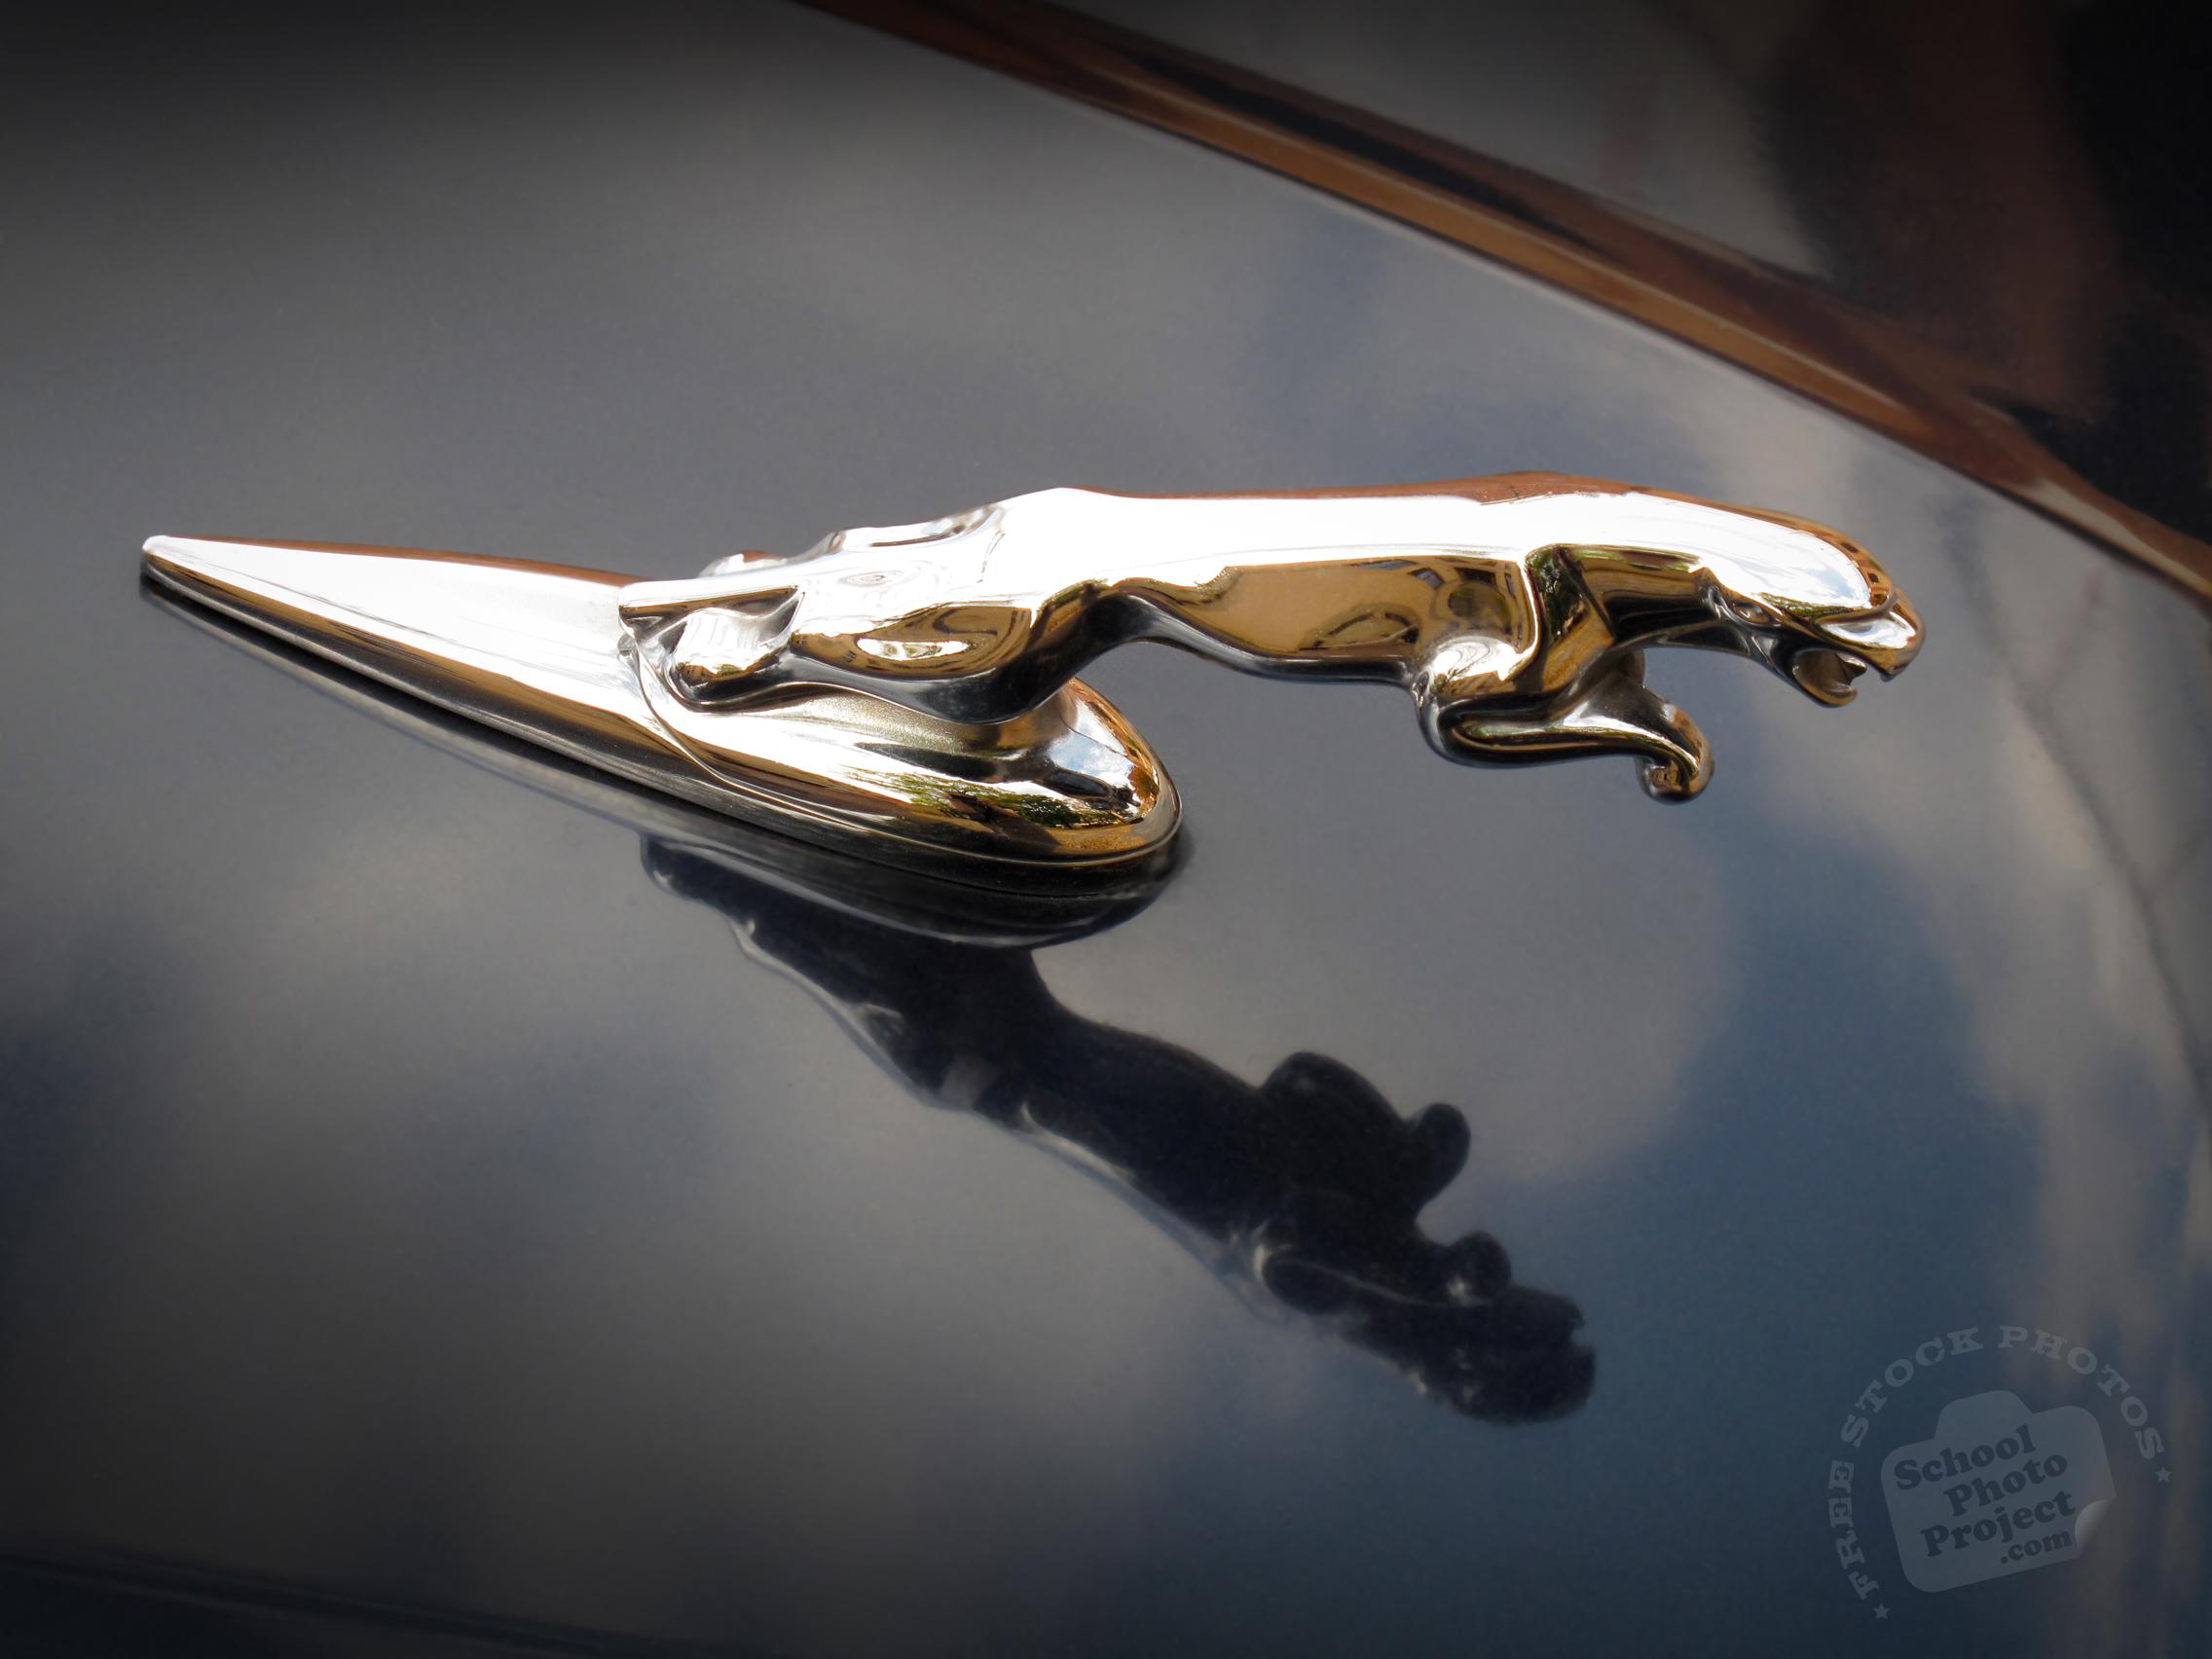 free jaguar logo jaguar mark identity famous car identity royalty